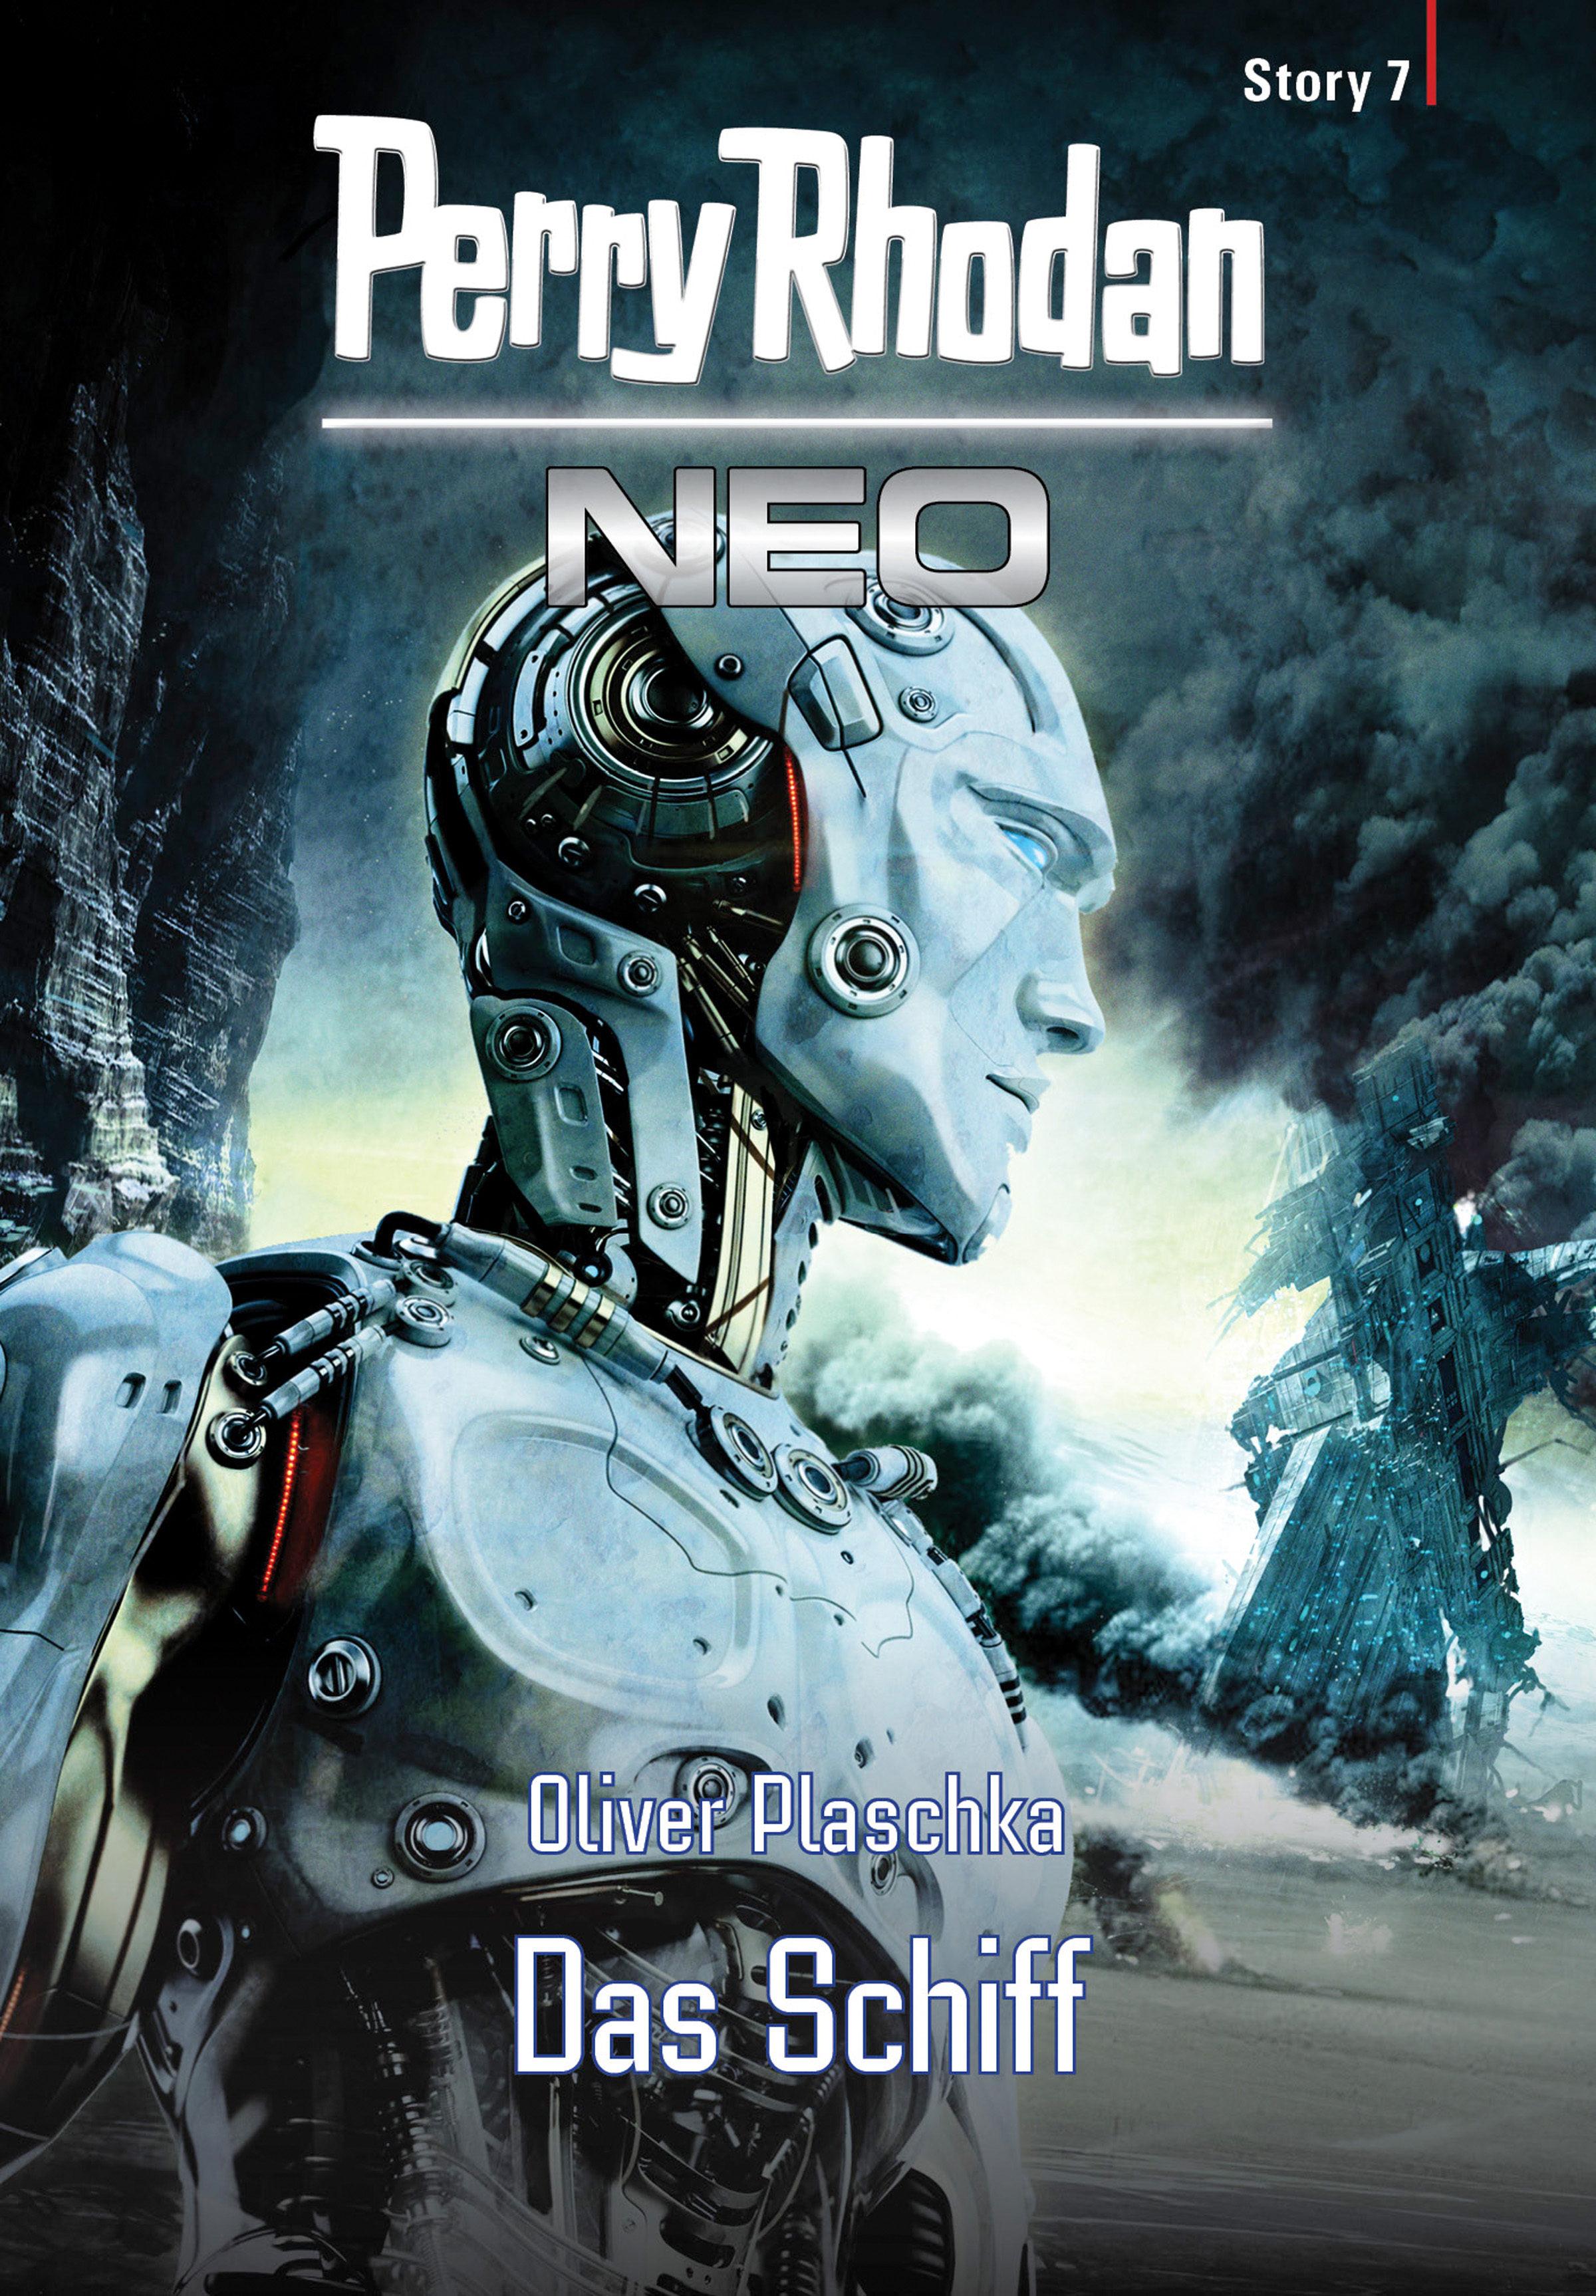 Perry Rhodan Neo Story 7 Das Schiff Ebook Oliver Plaschka